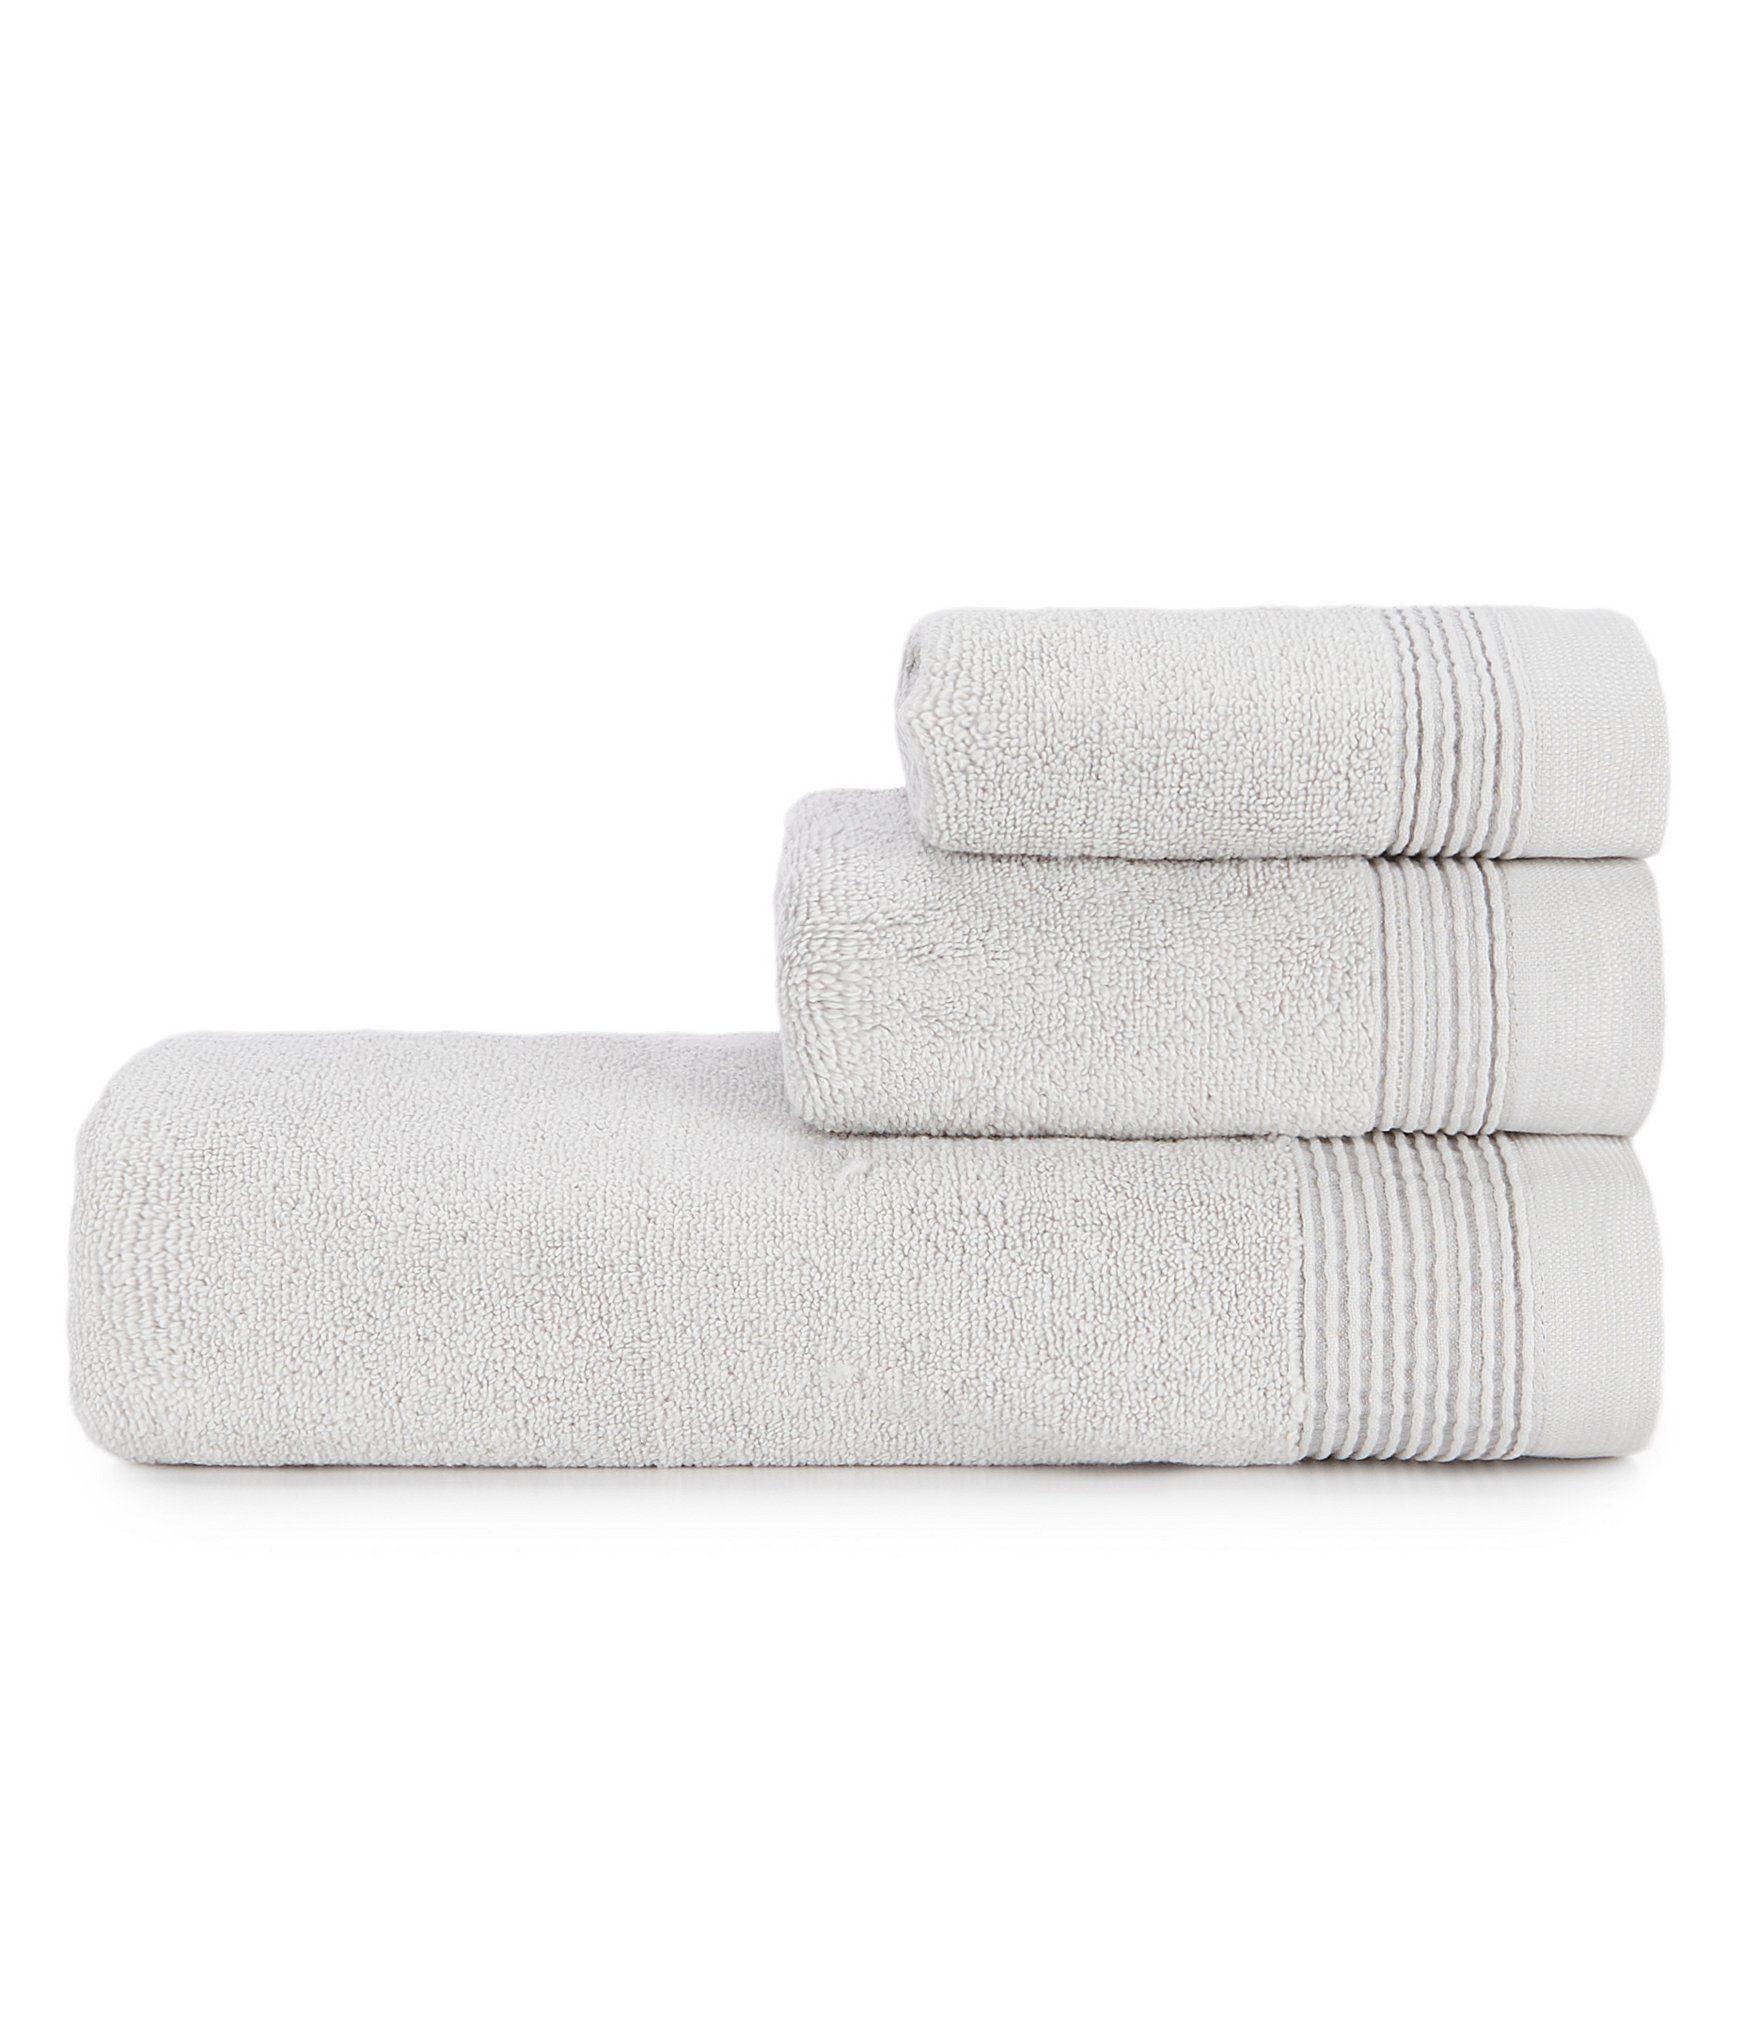 H Halston Ribbed Pinstripe Bath Towels - Bright White Bath Towel #handtowels